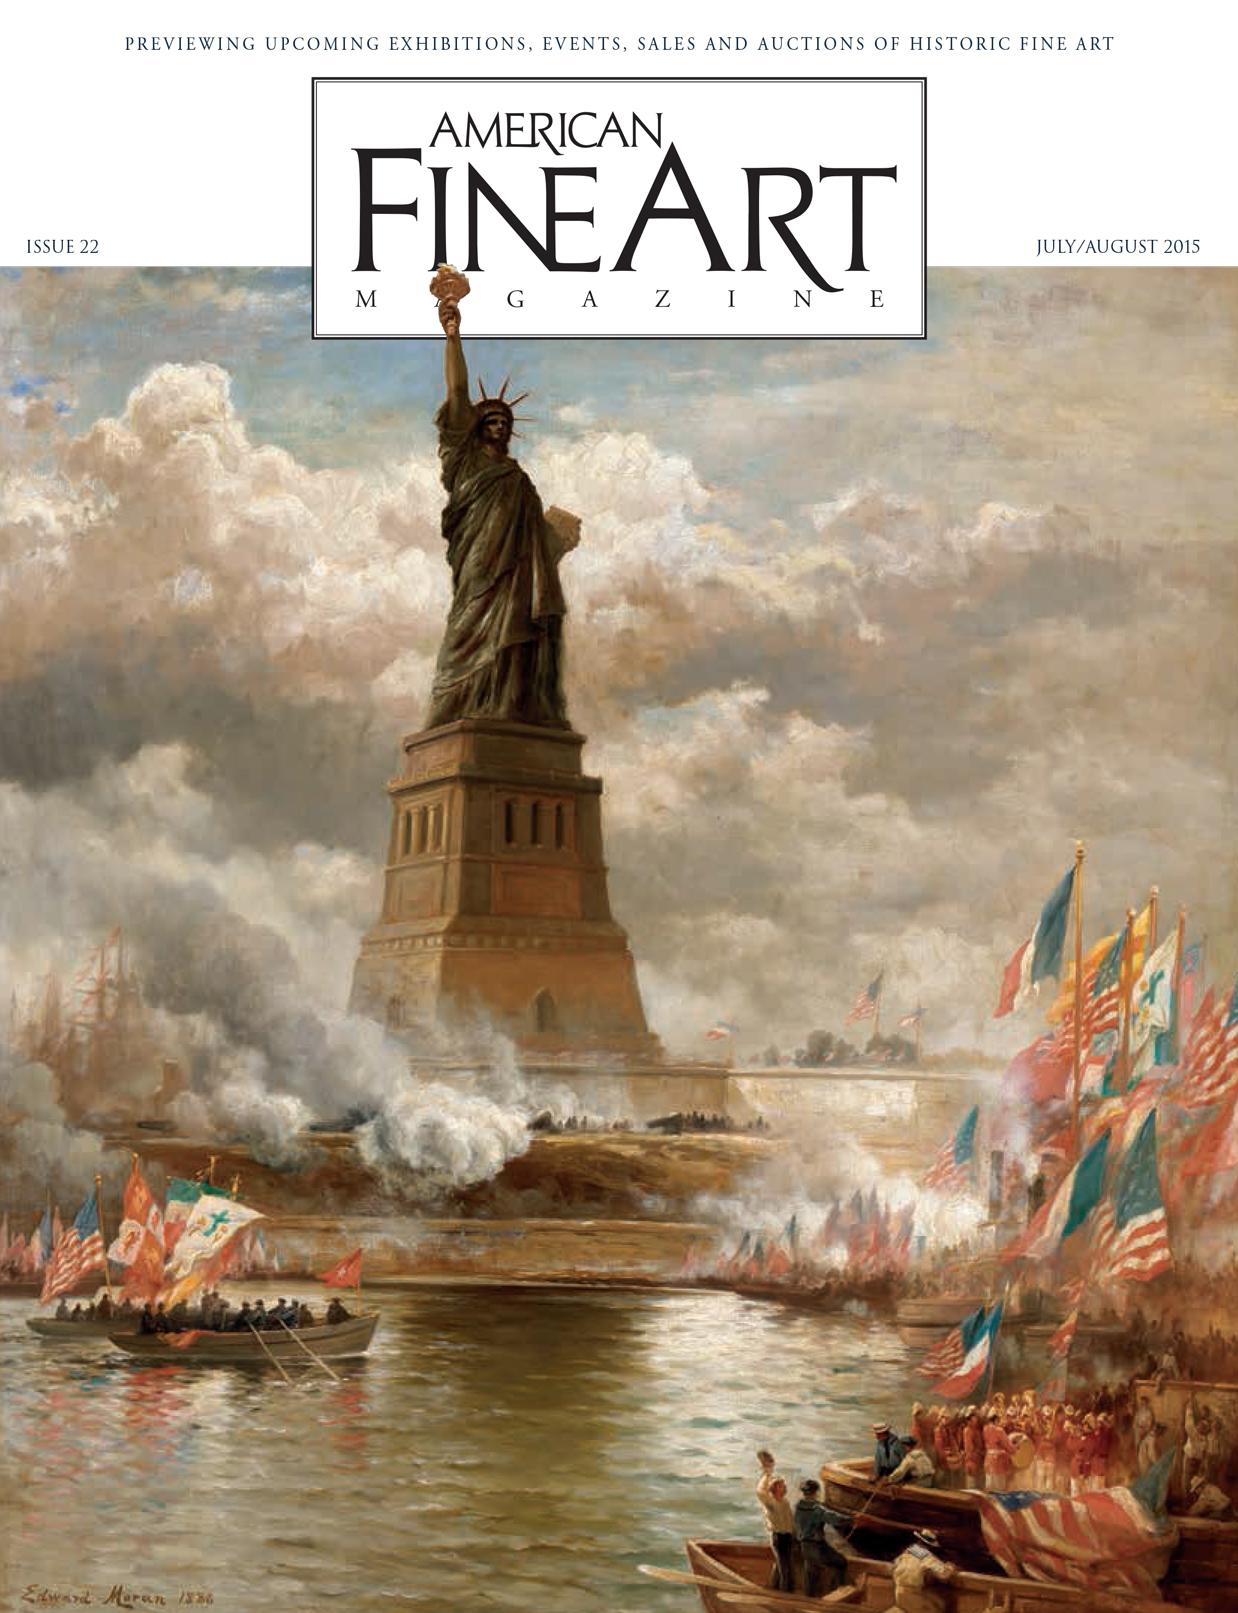 am-fine-arts-julyaug15-cover_559c1860b5127.jpg